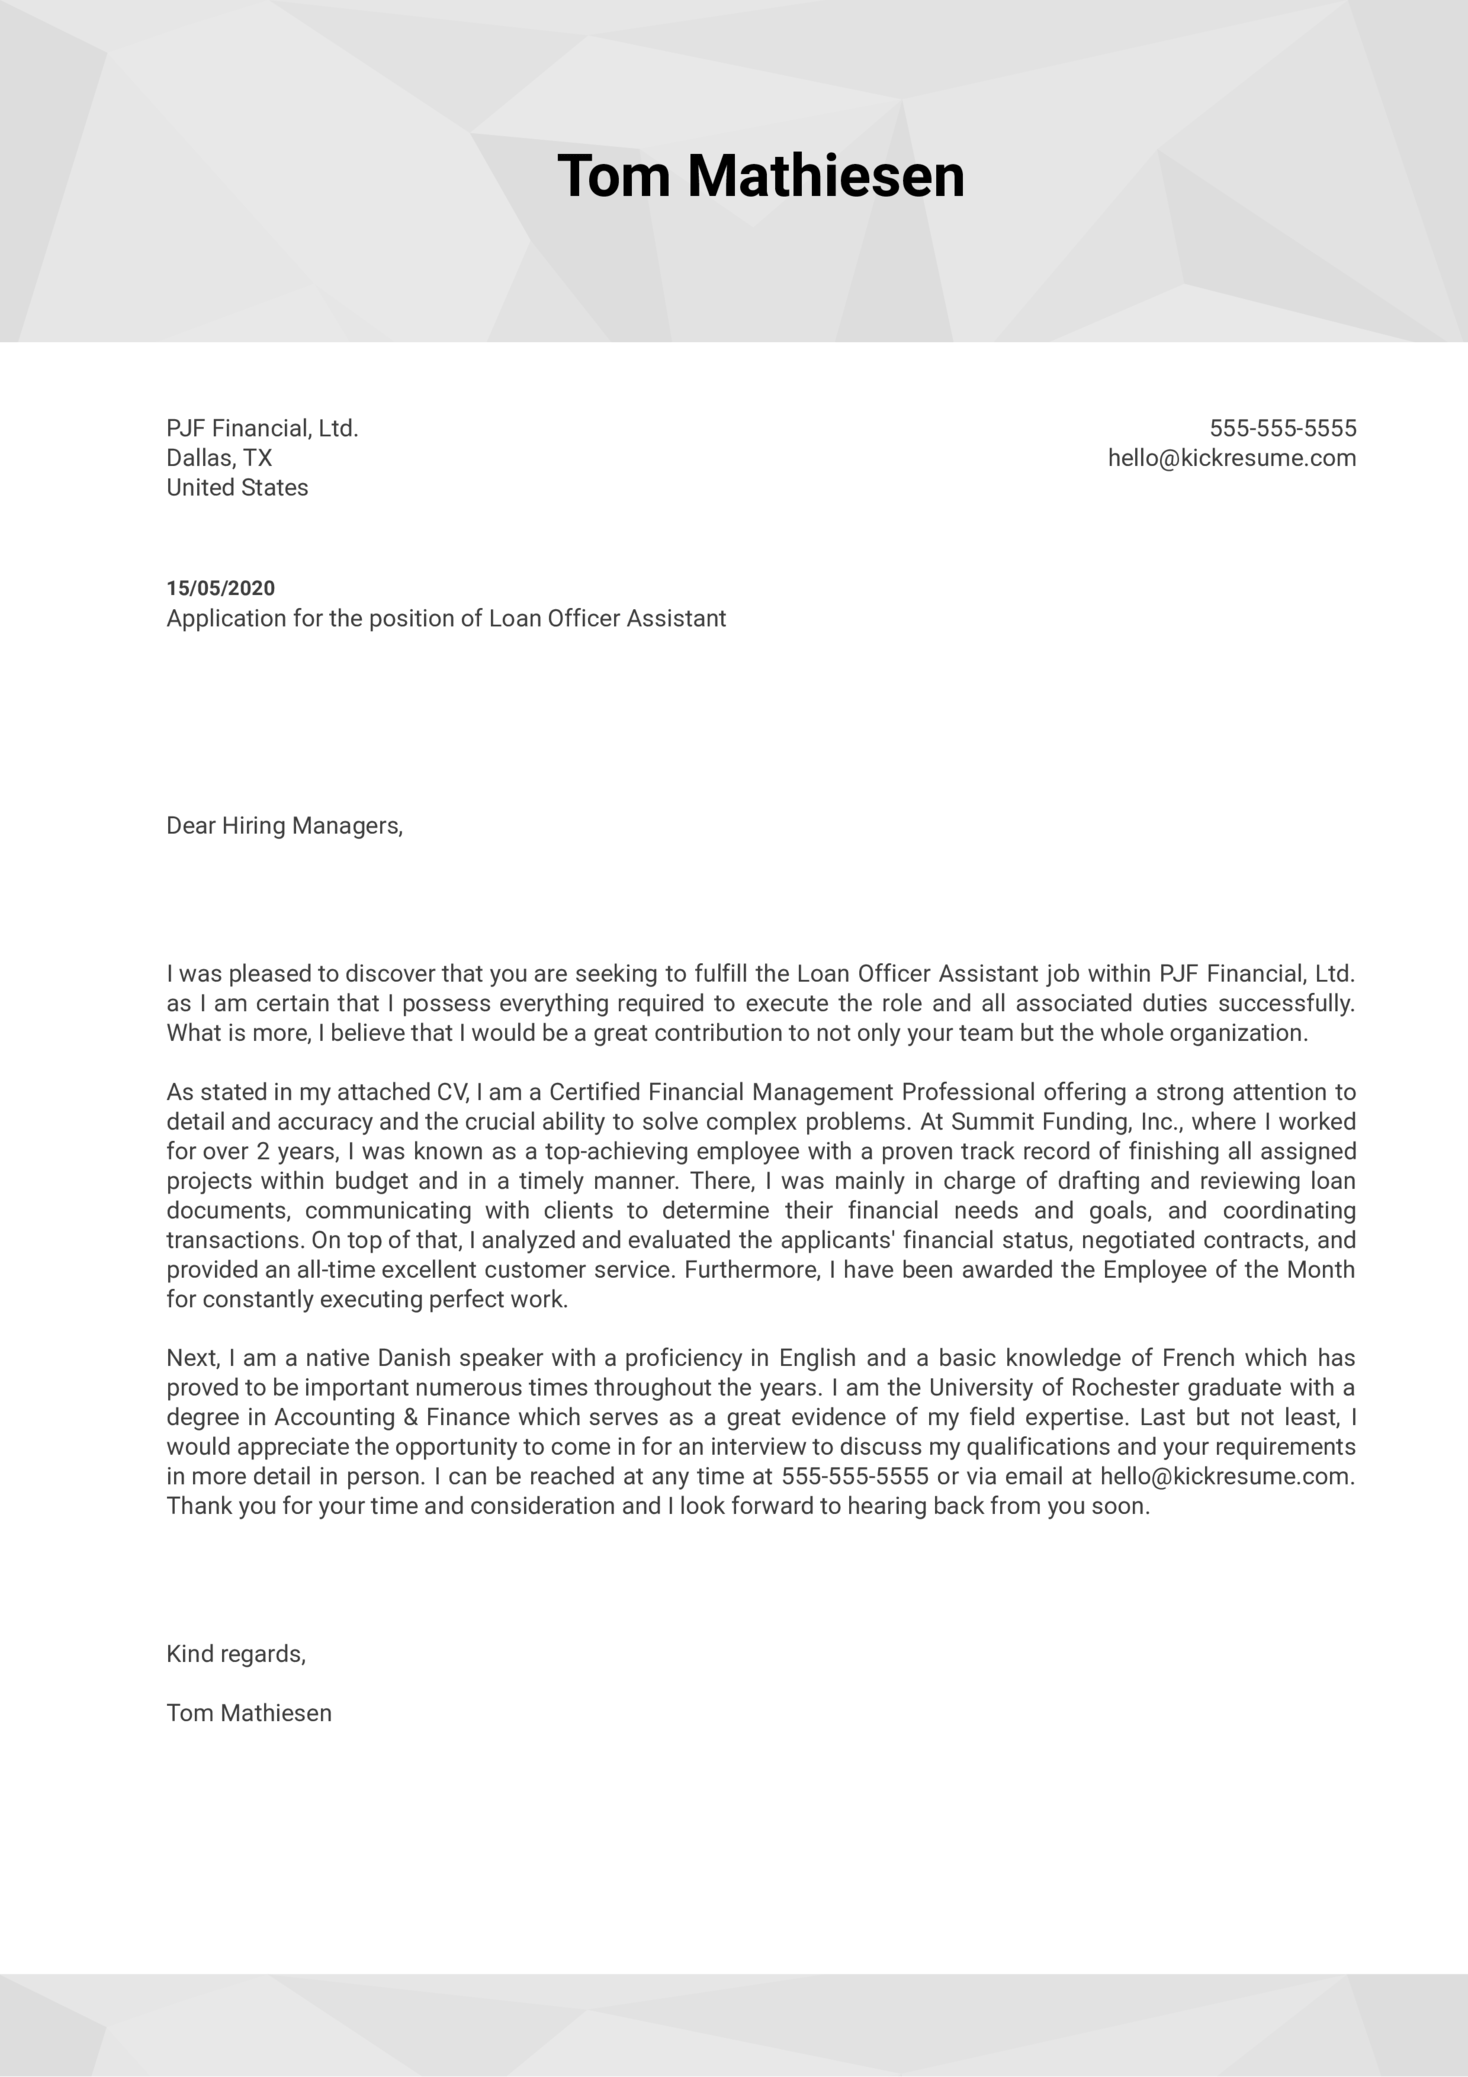 Loan Officer Assistant Cover Letter Sample